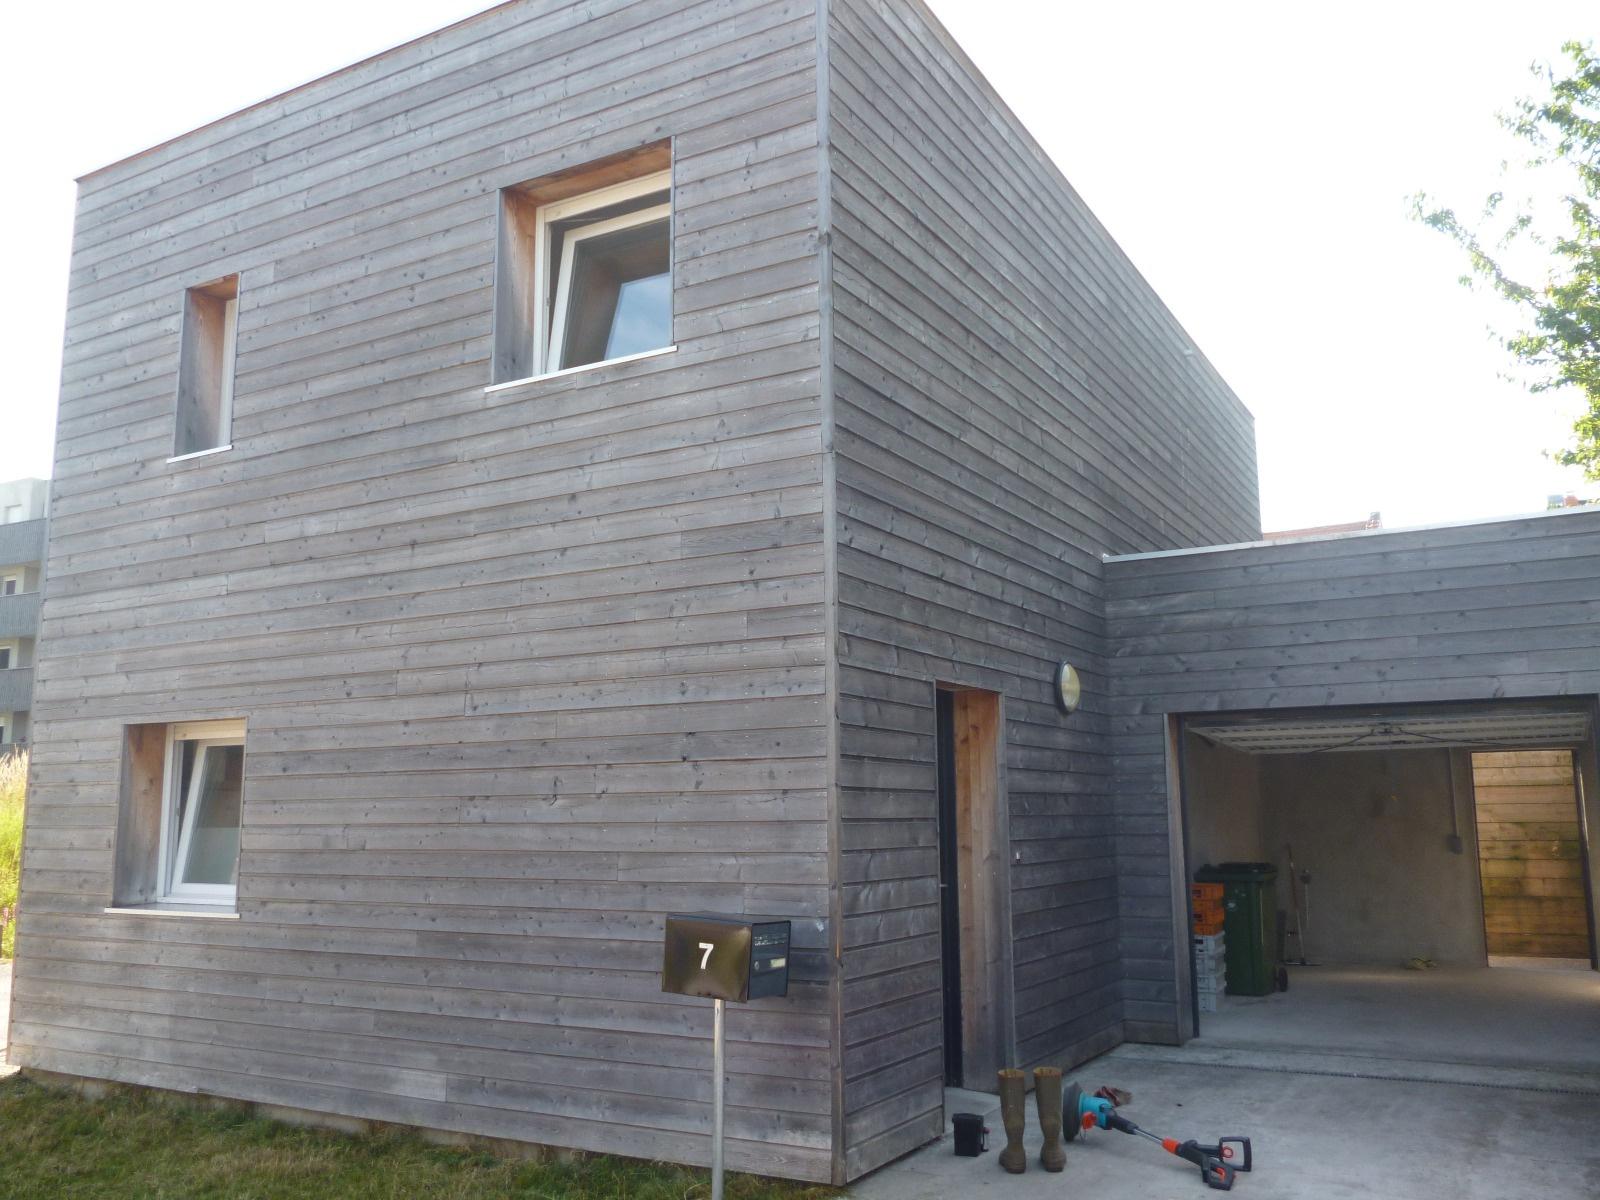 Annonce location maison amiens 80000 83 m 900 for Amiens location maison